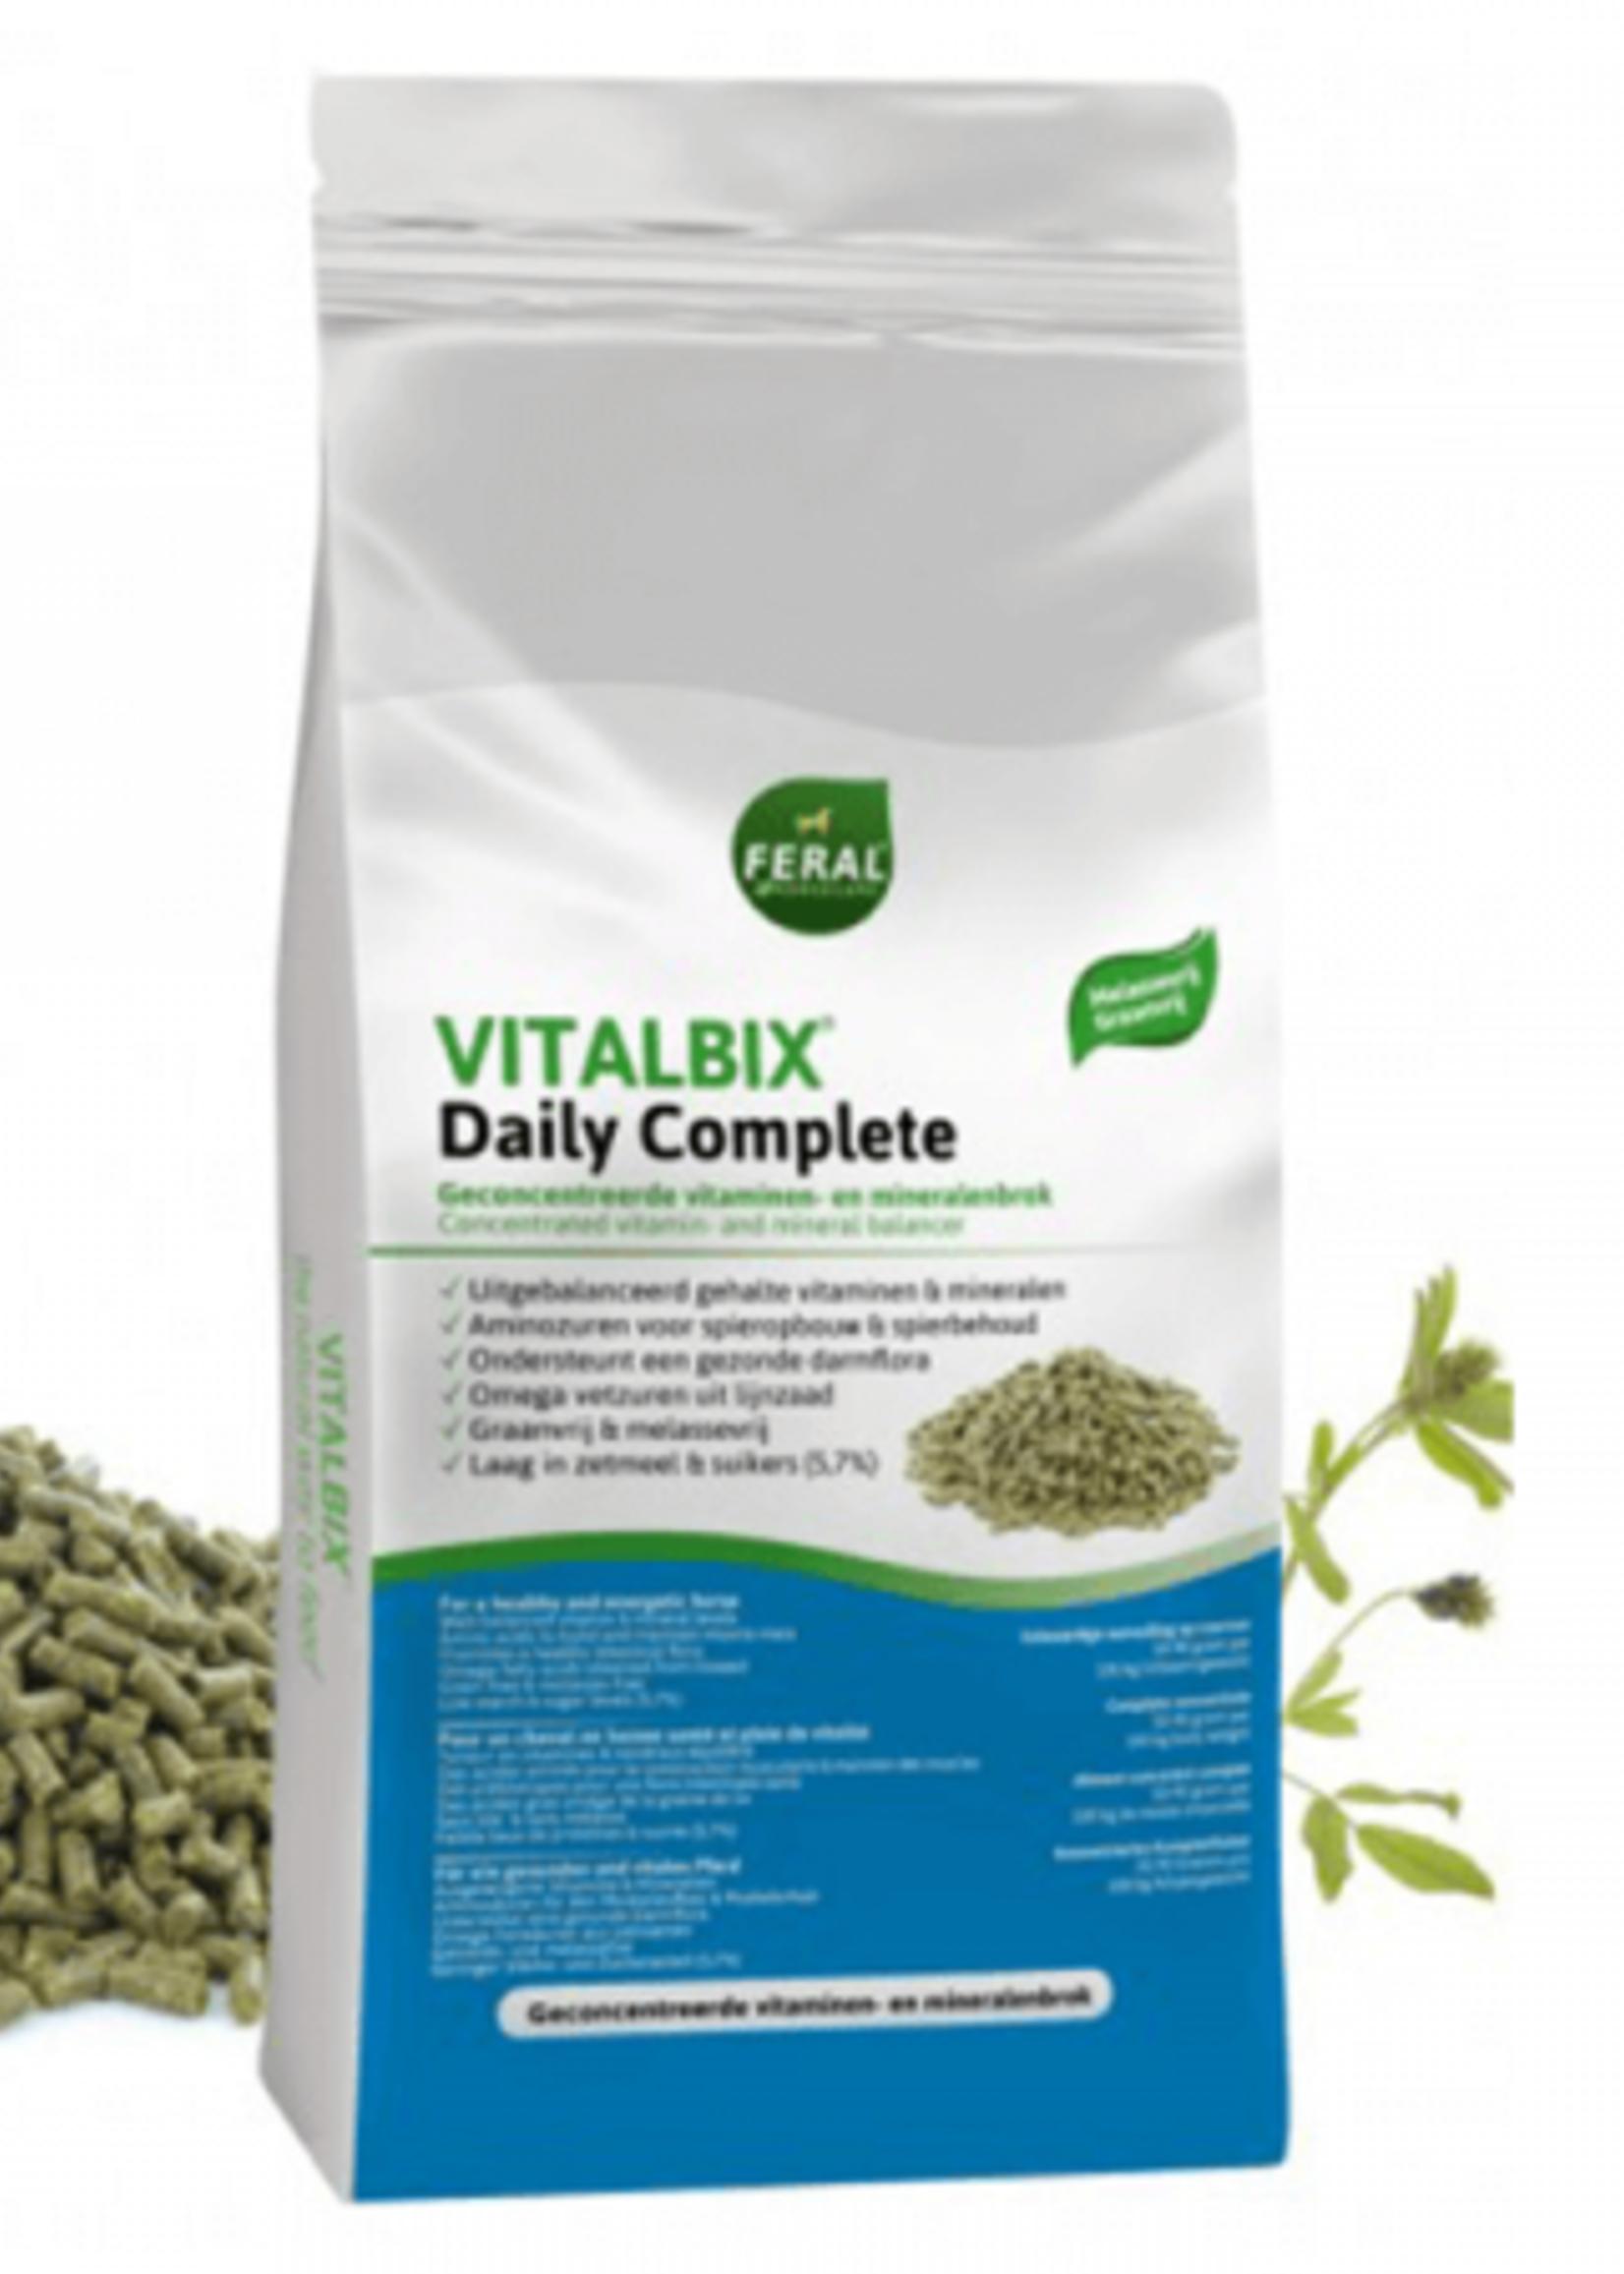 Vitalbix Vitalbix Daily Complete Original14kg